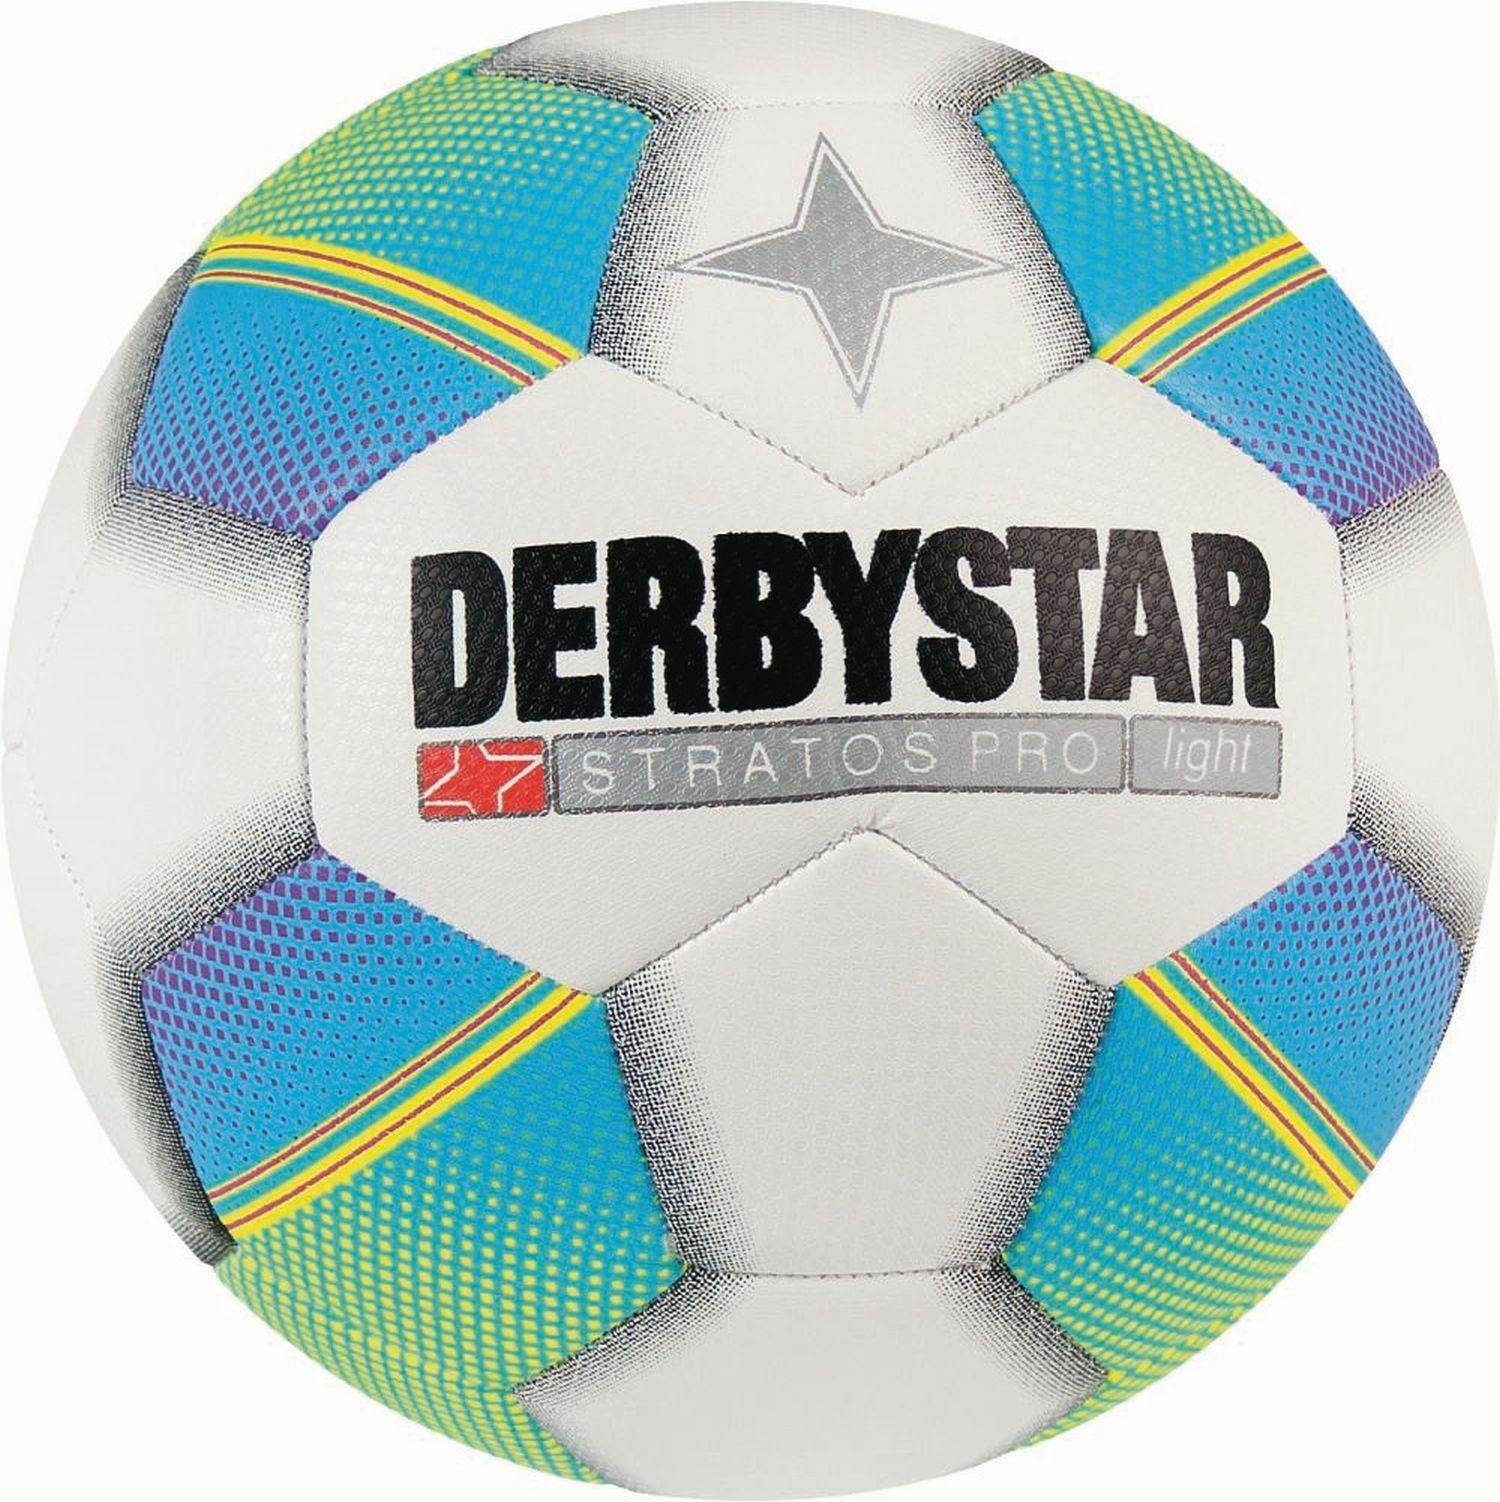 10x Derbystar Jugendfußball Stratos PRO Light  350g Größe 4 Neues Modell 2018